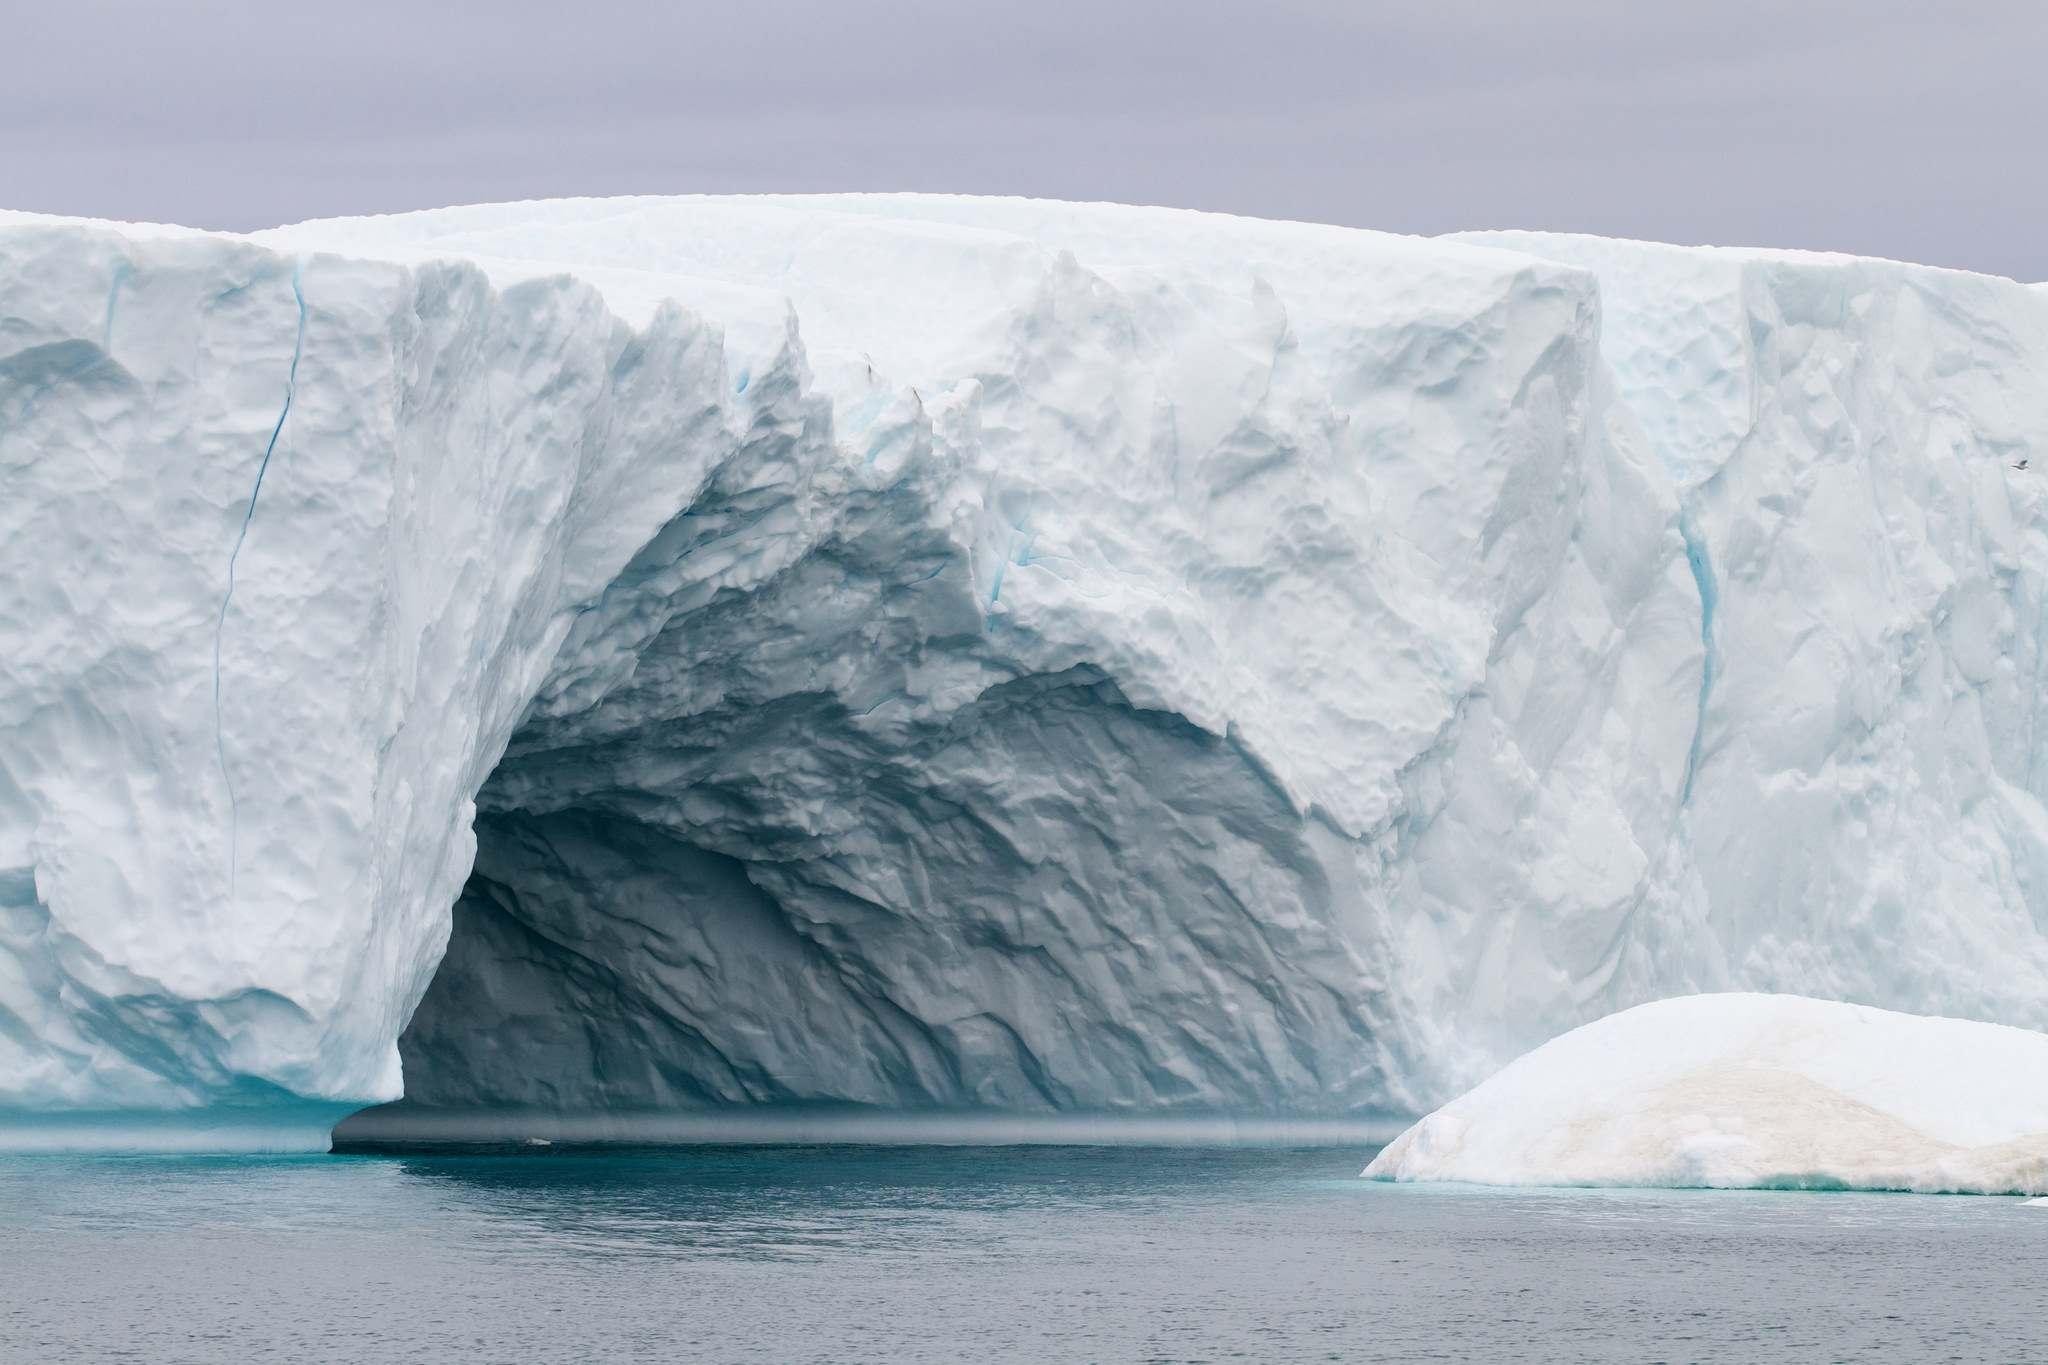 icefjord ilulissat6 The icefjord in Ilulissat, Greenland